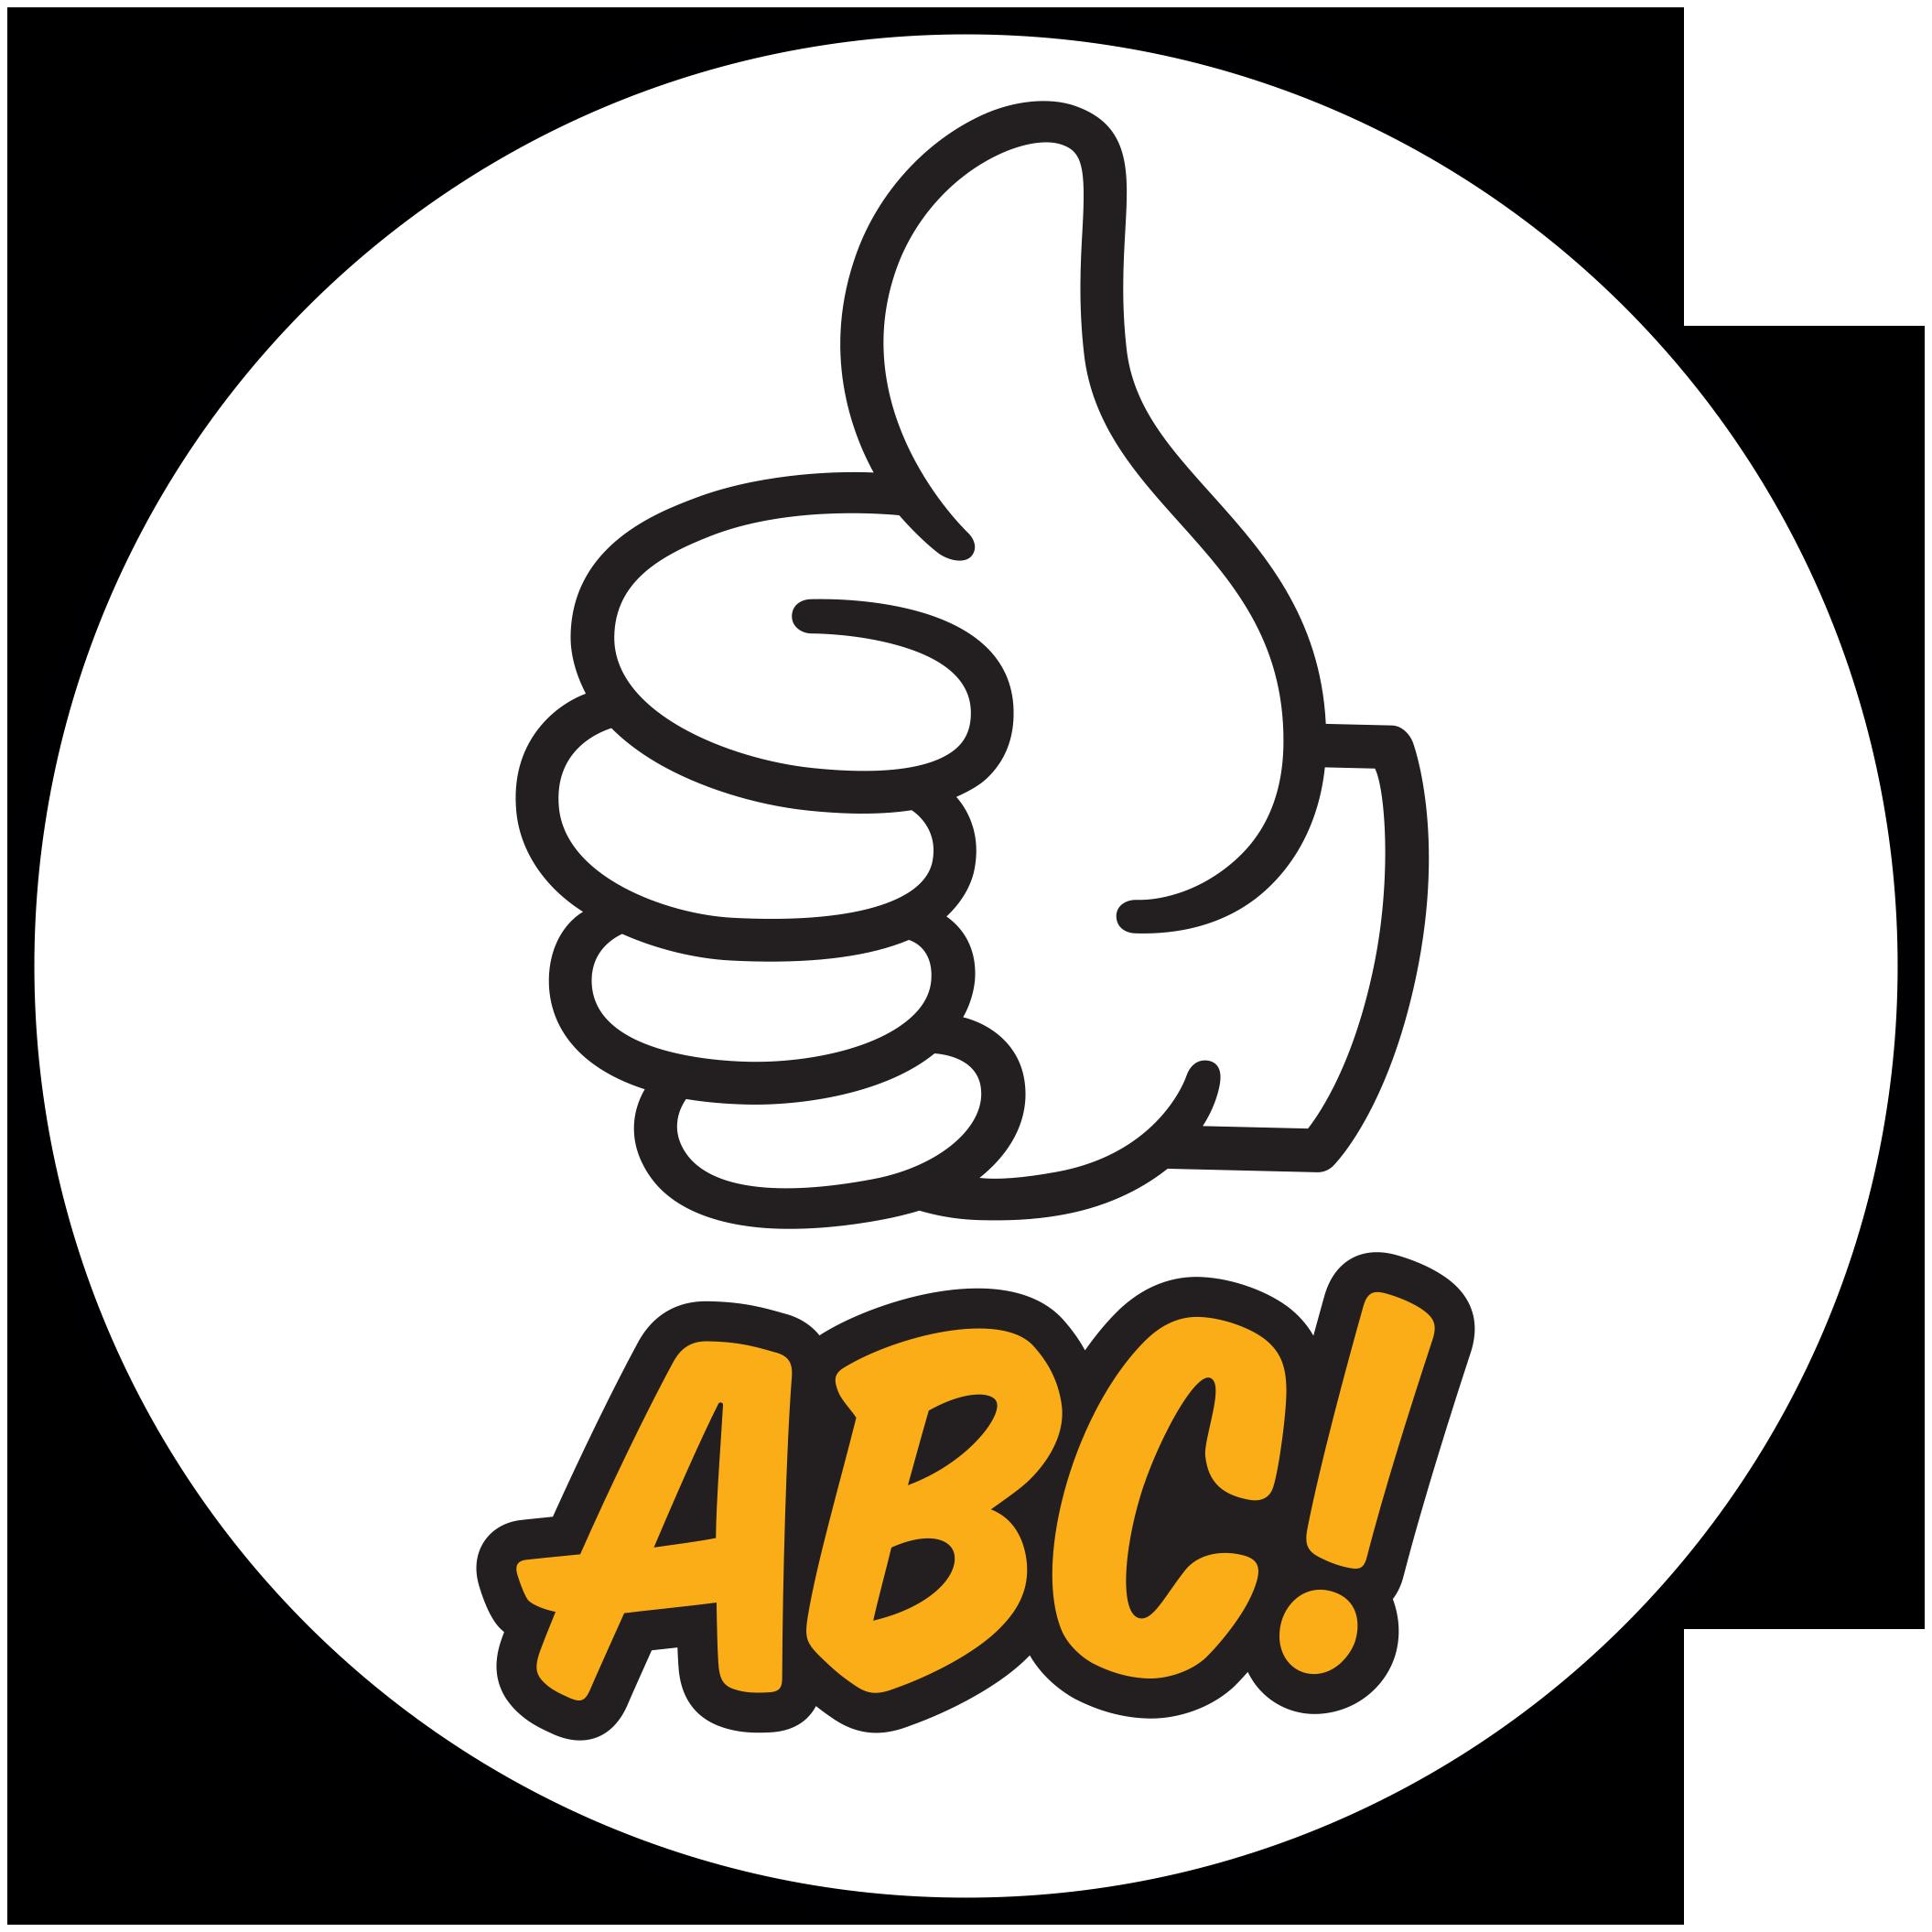 ABC Lohja